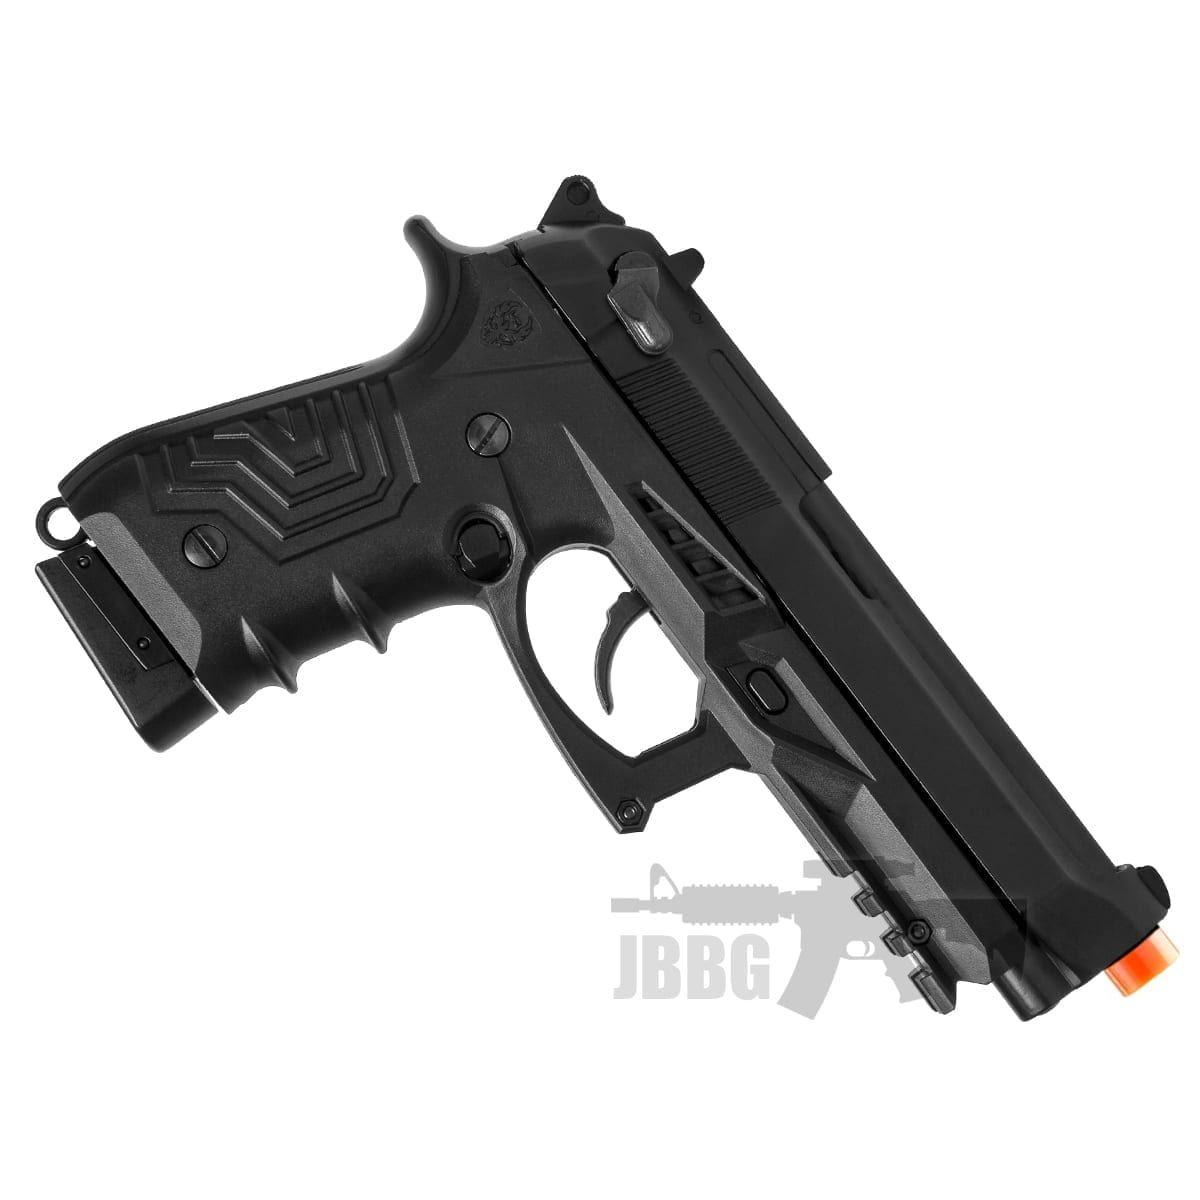 hg173 airsoft pistol